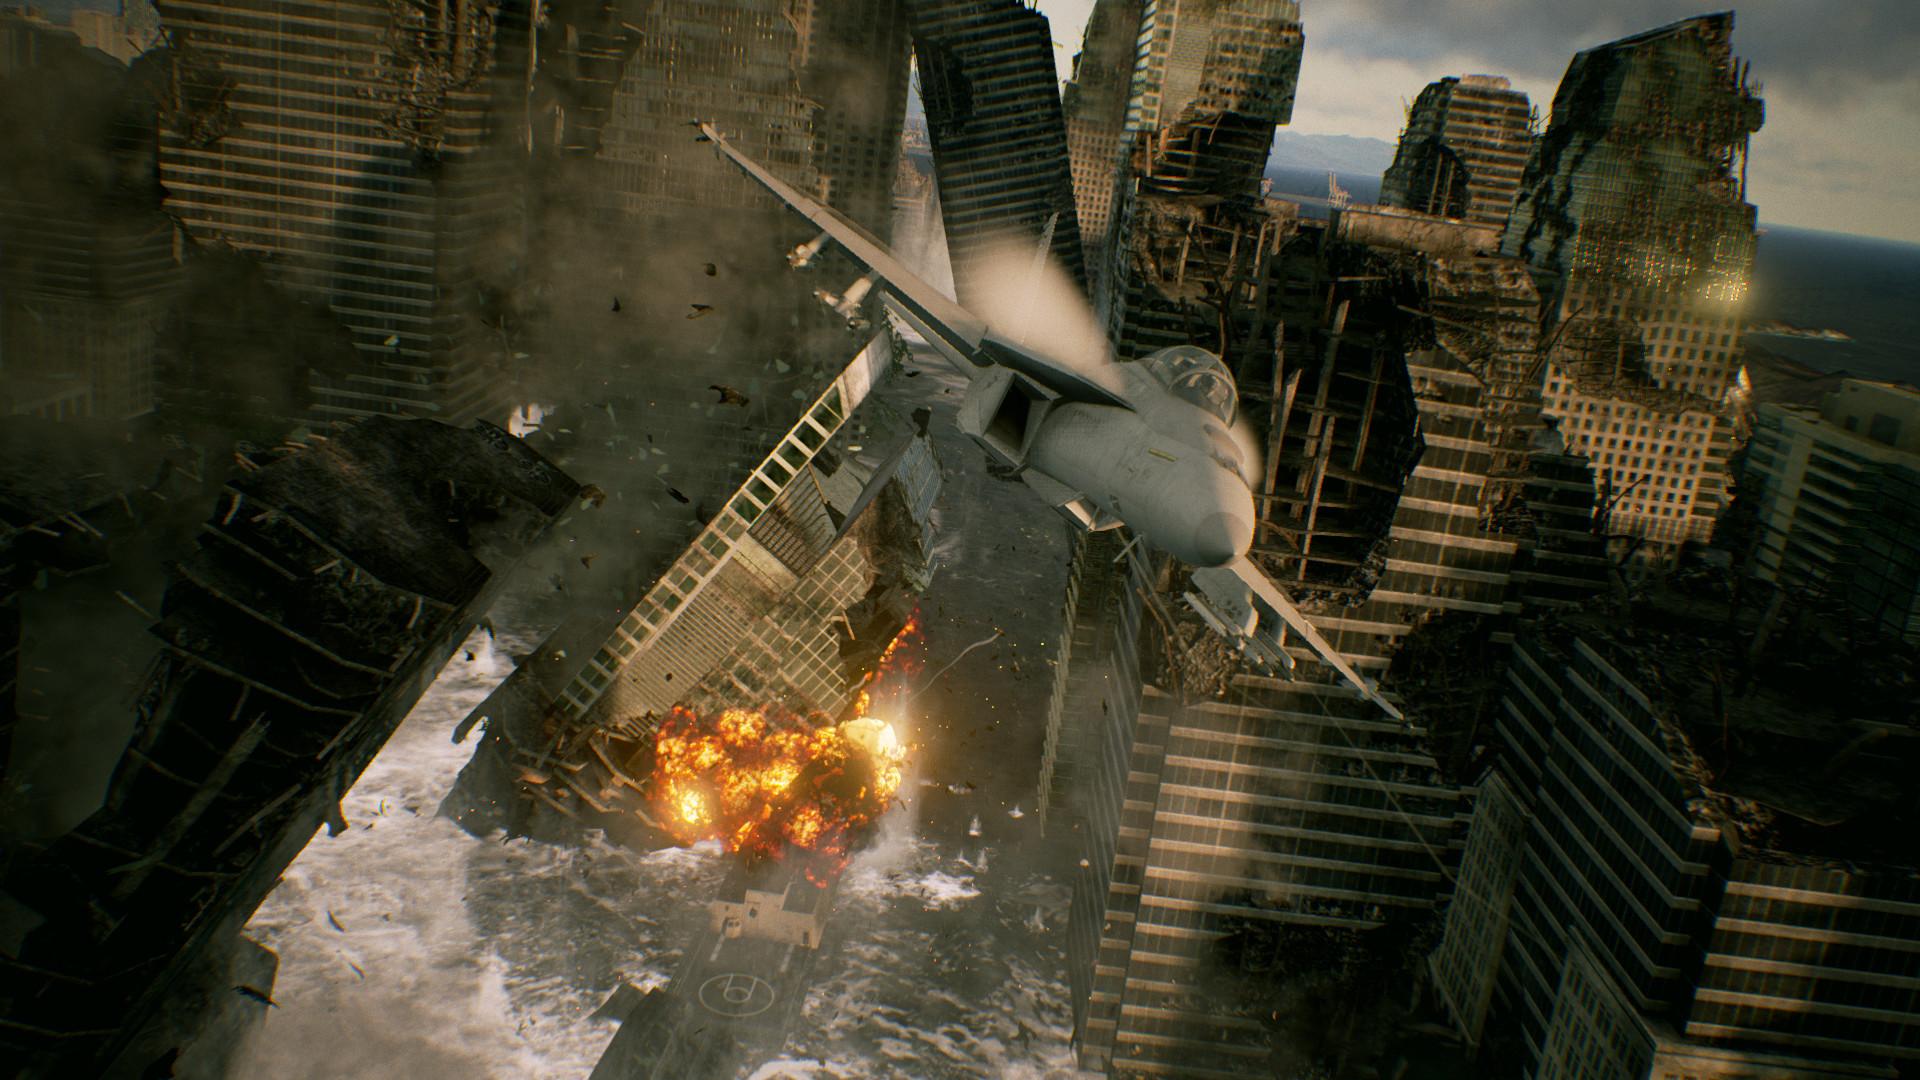 Ace Combat 7: Skies Unknown (BANDAI NAMCO Entertainment) (RUS|ENG|MULTi)